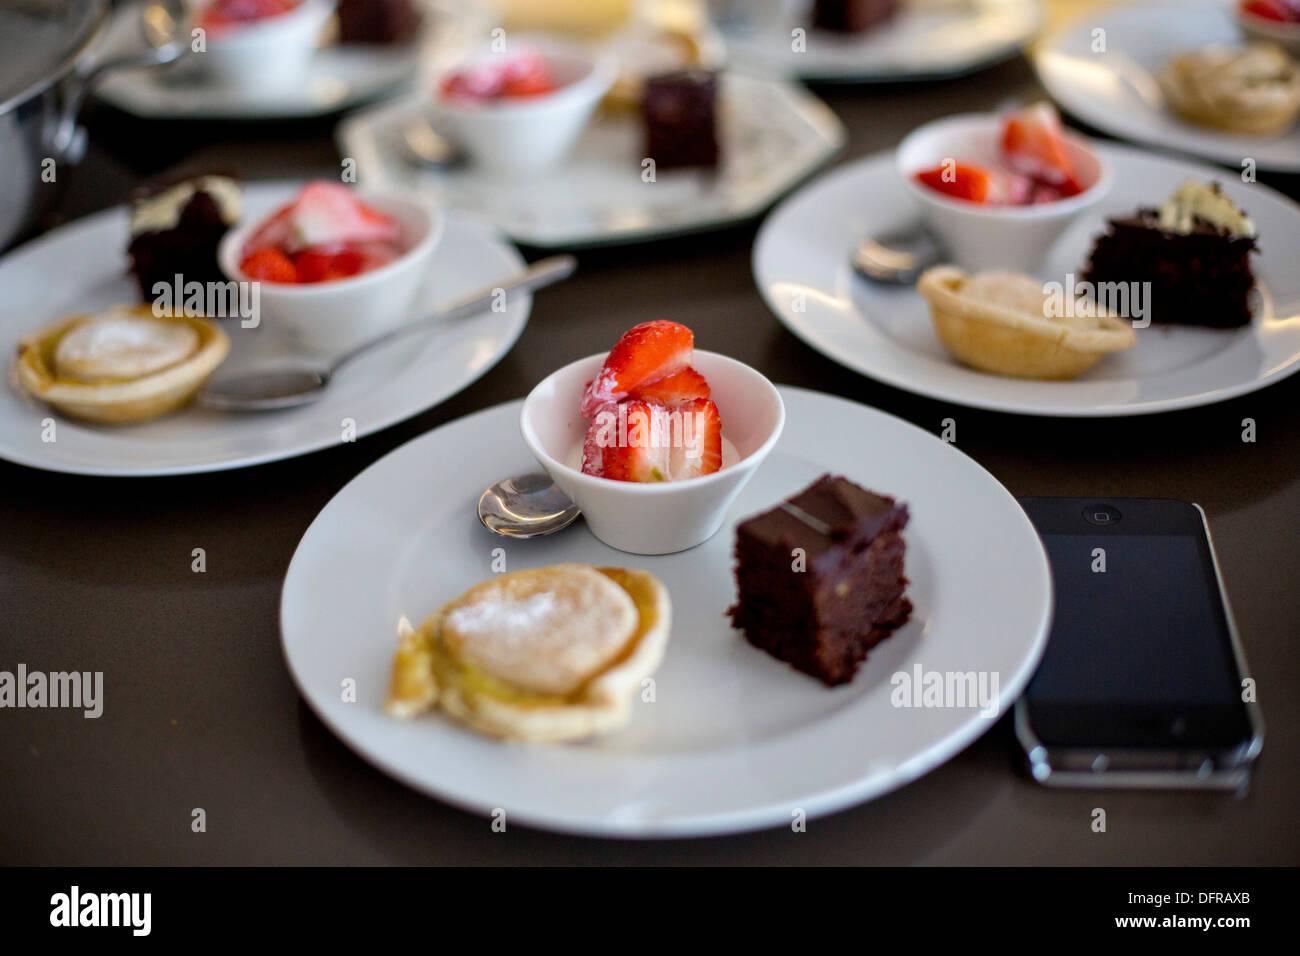 trio of deserts strawberries apple pie chocolate cake - Stock Image